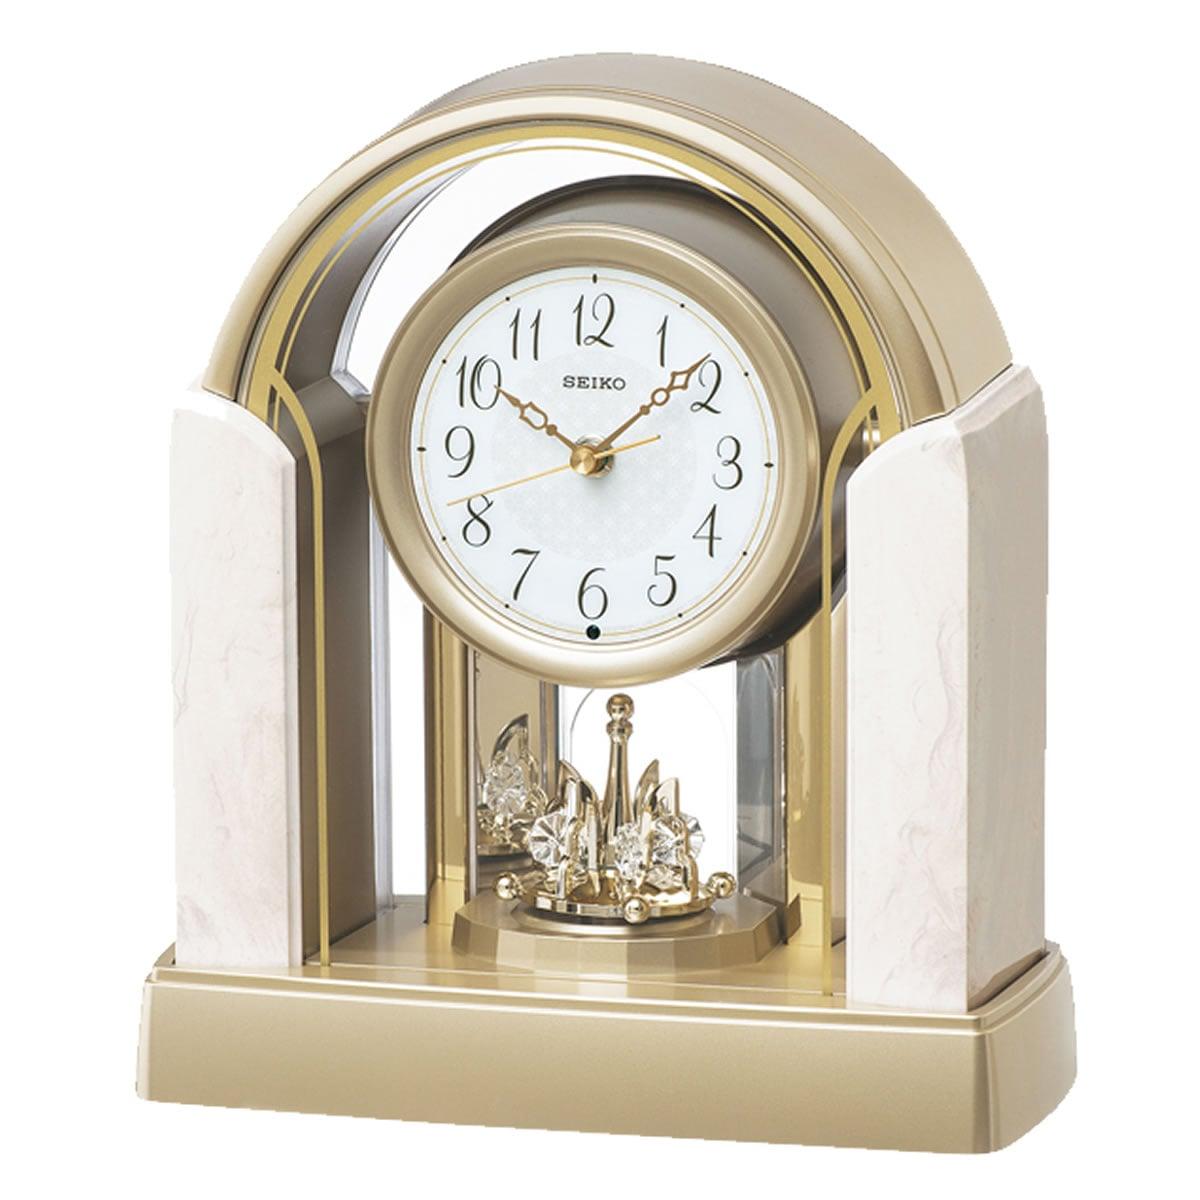 SEIKO セイコー 回転飾り付 電波置き時計 BY236G